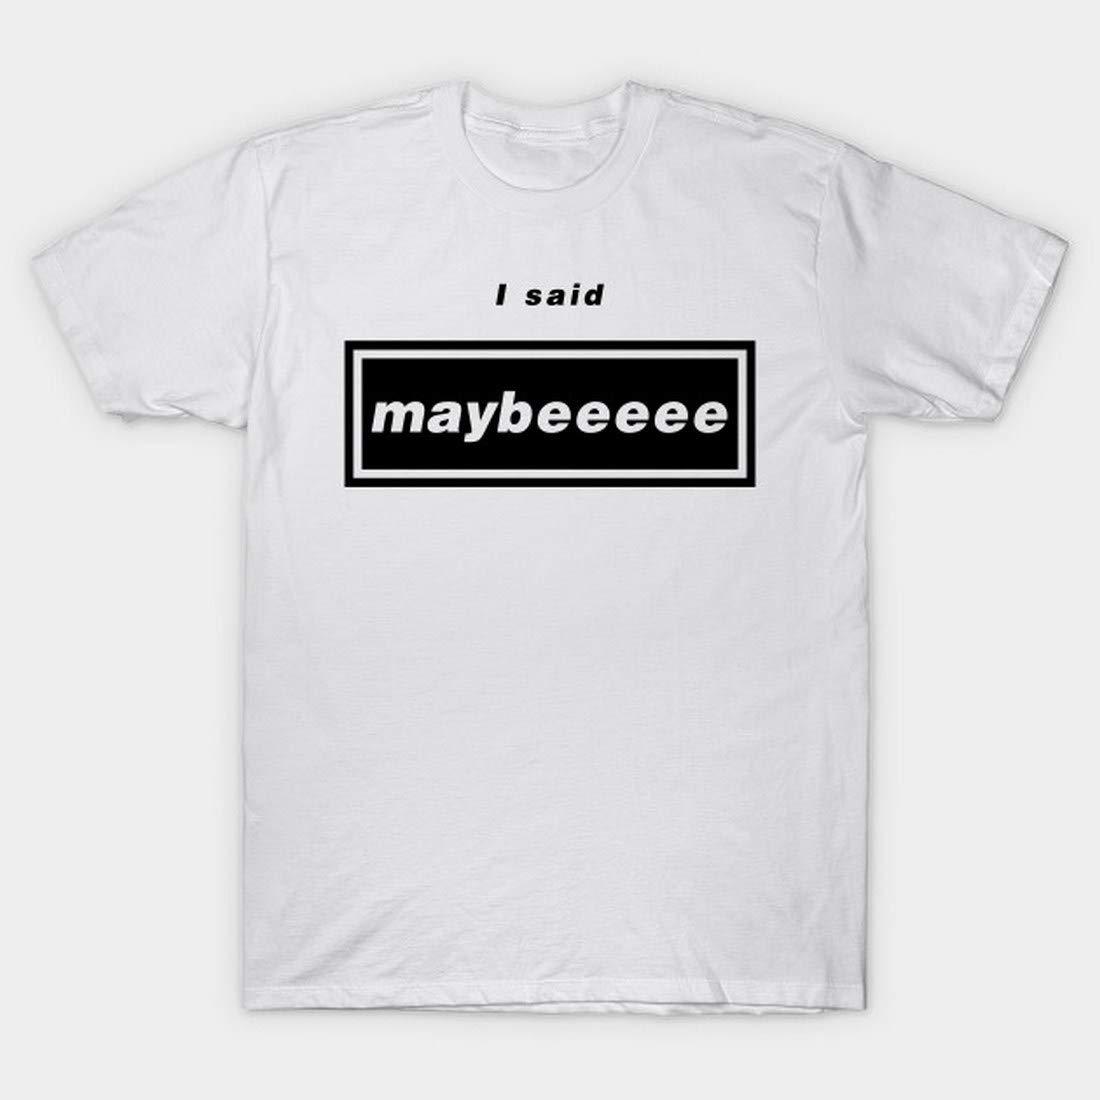 Wonderwall Oasiss I Said Maybeeeee Liams Gallaghers Love Music Rocks Bandss T Shirt T Shir